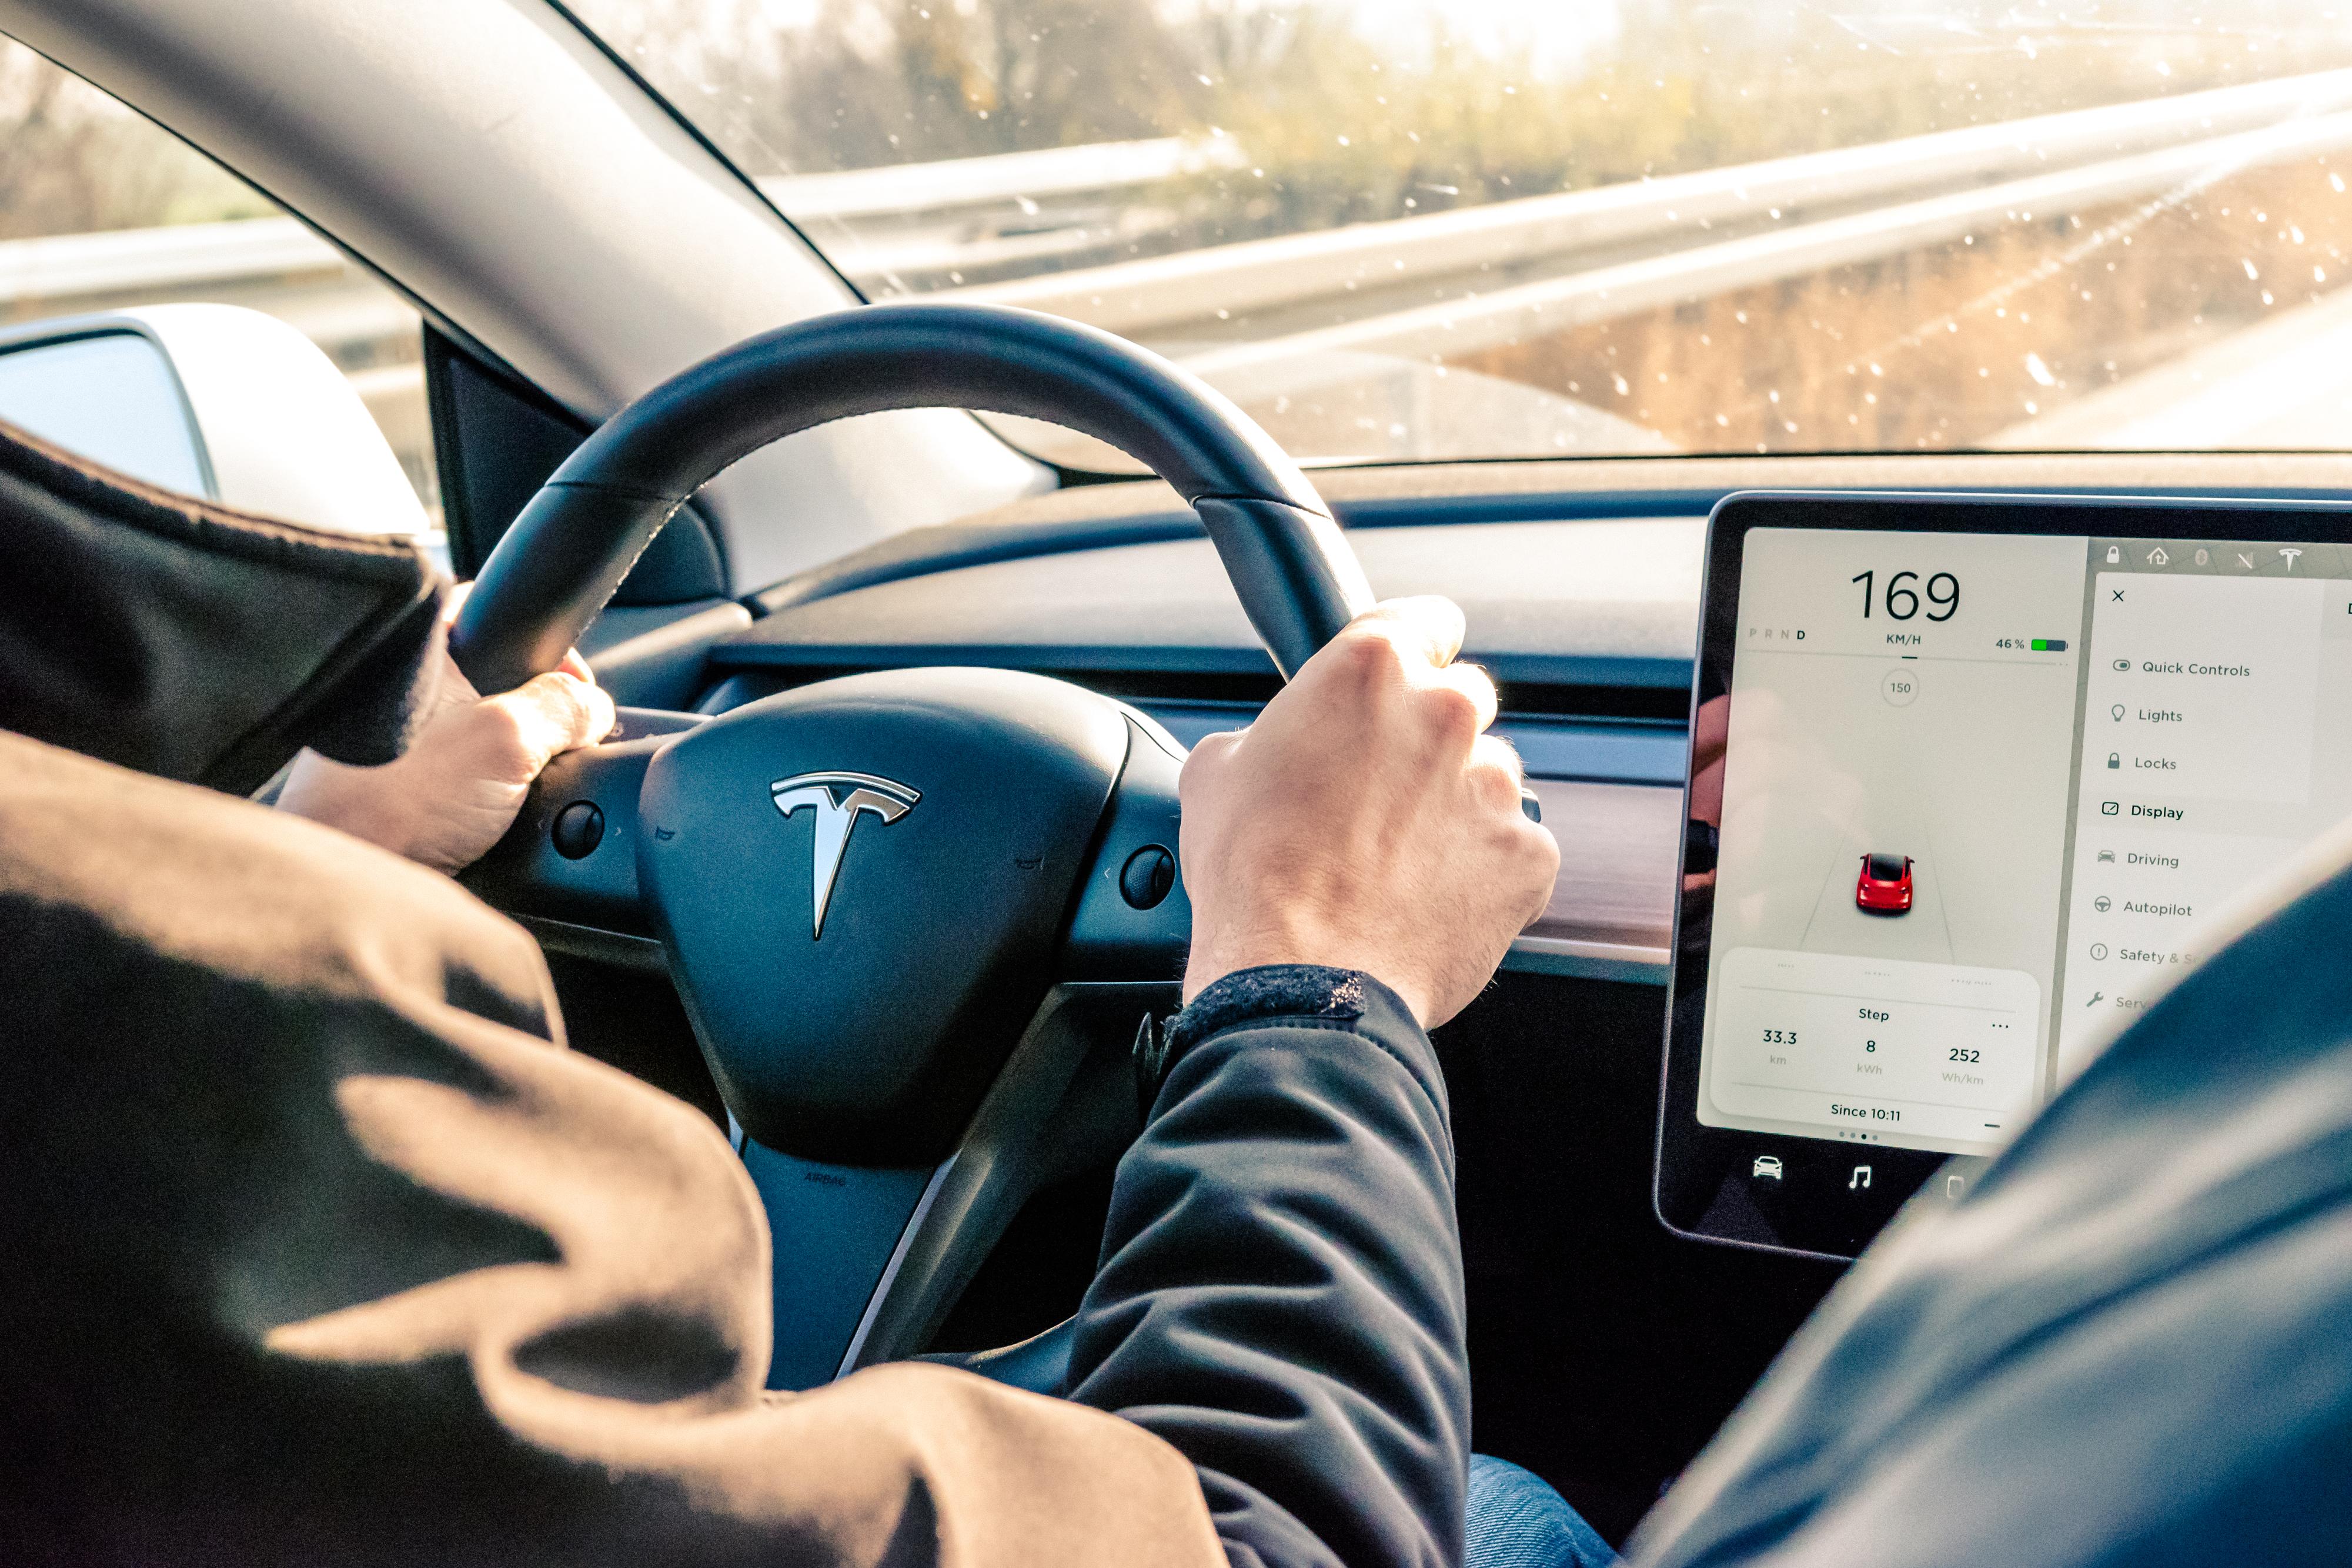 Tesla Model 3: Elon Musk Used 'Monty Python' to Give Car Its